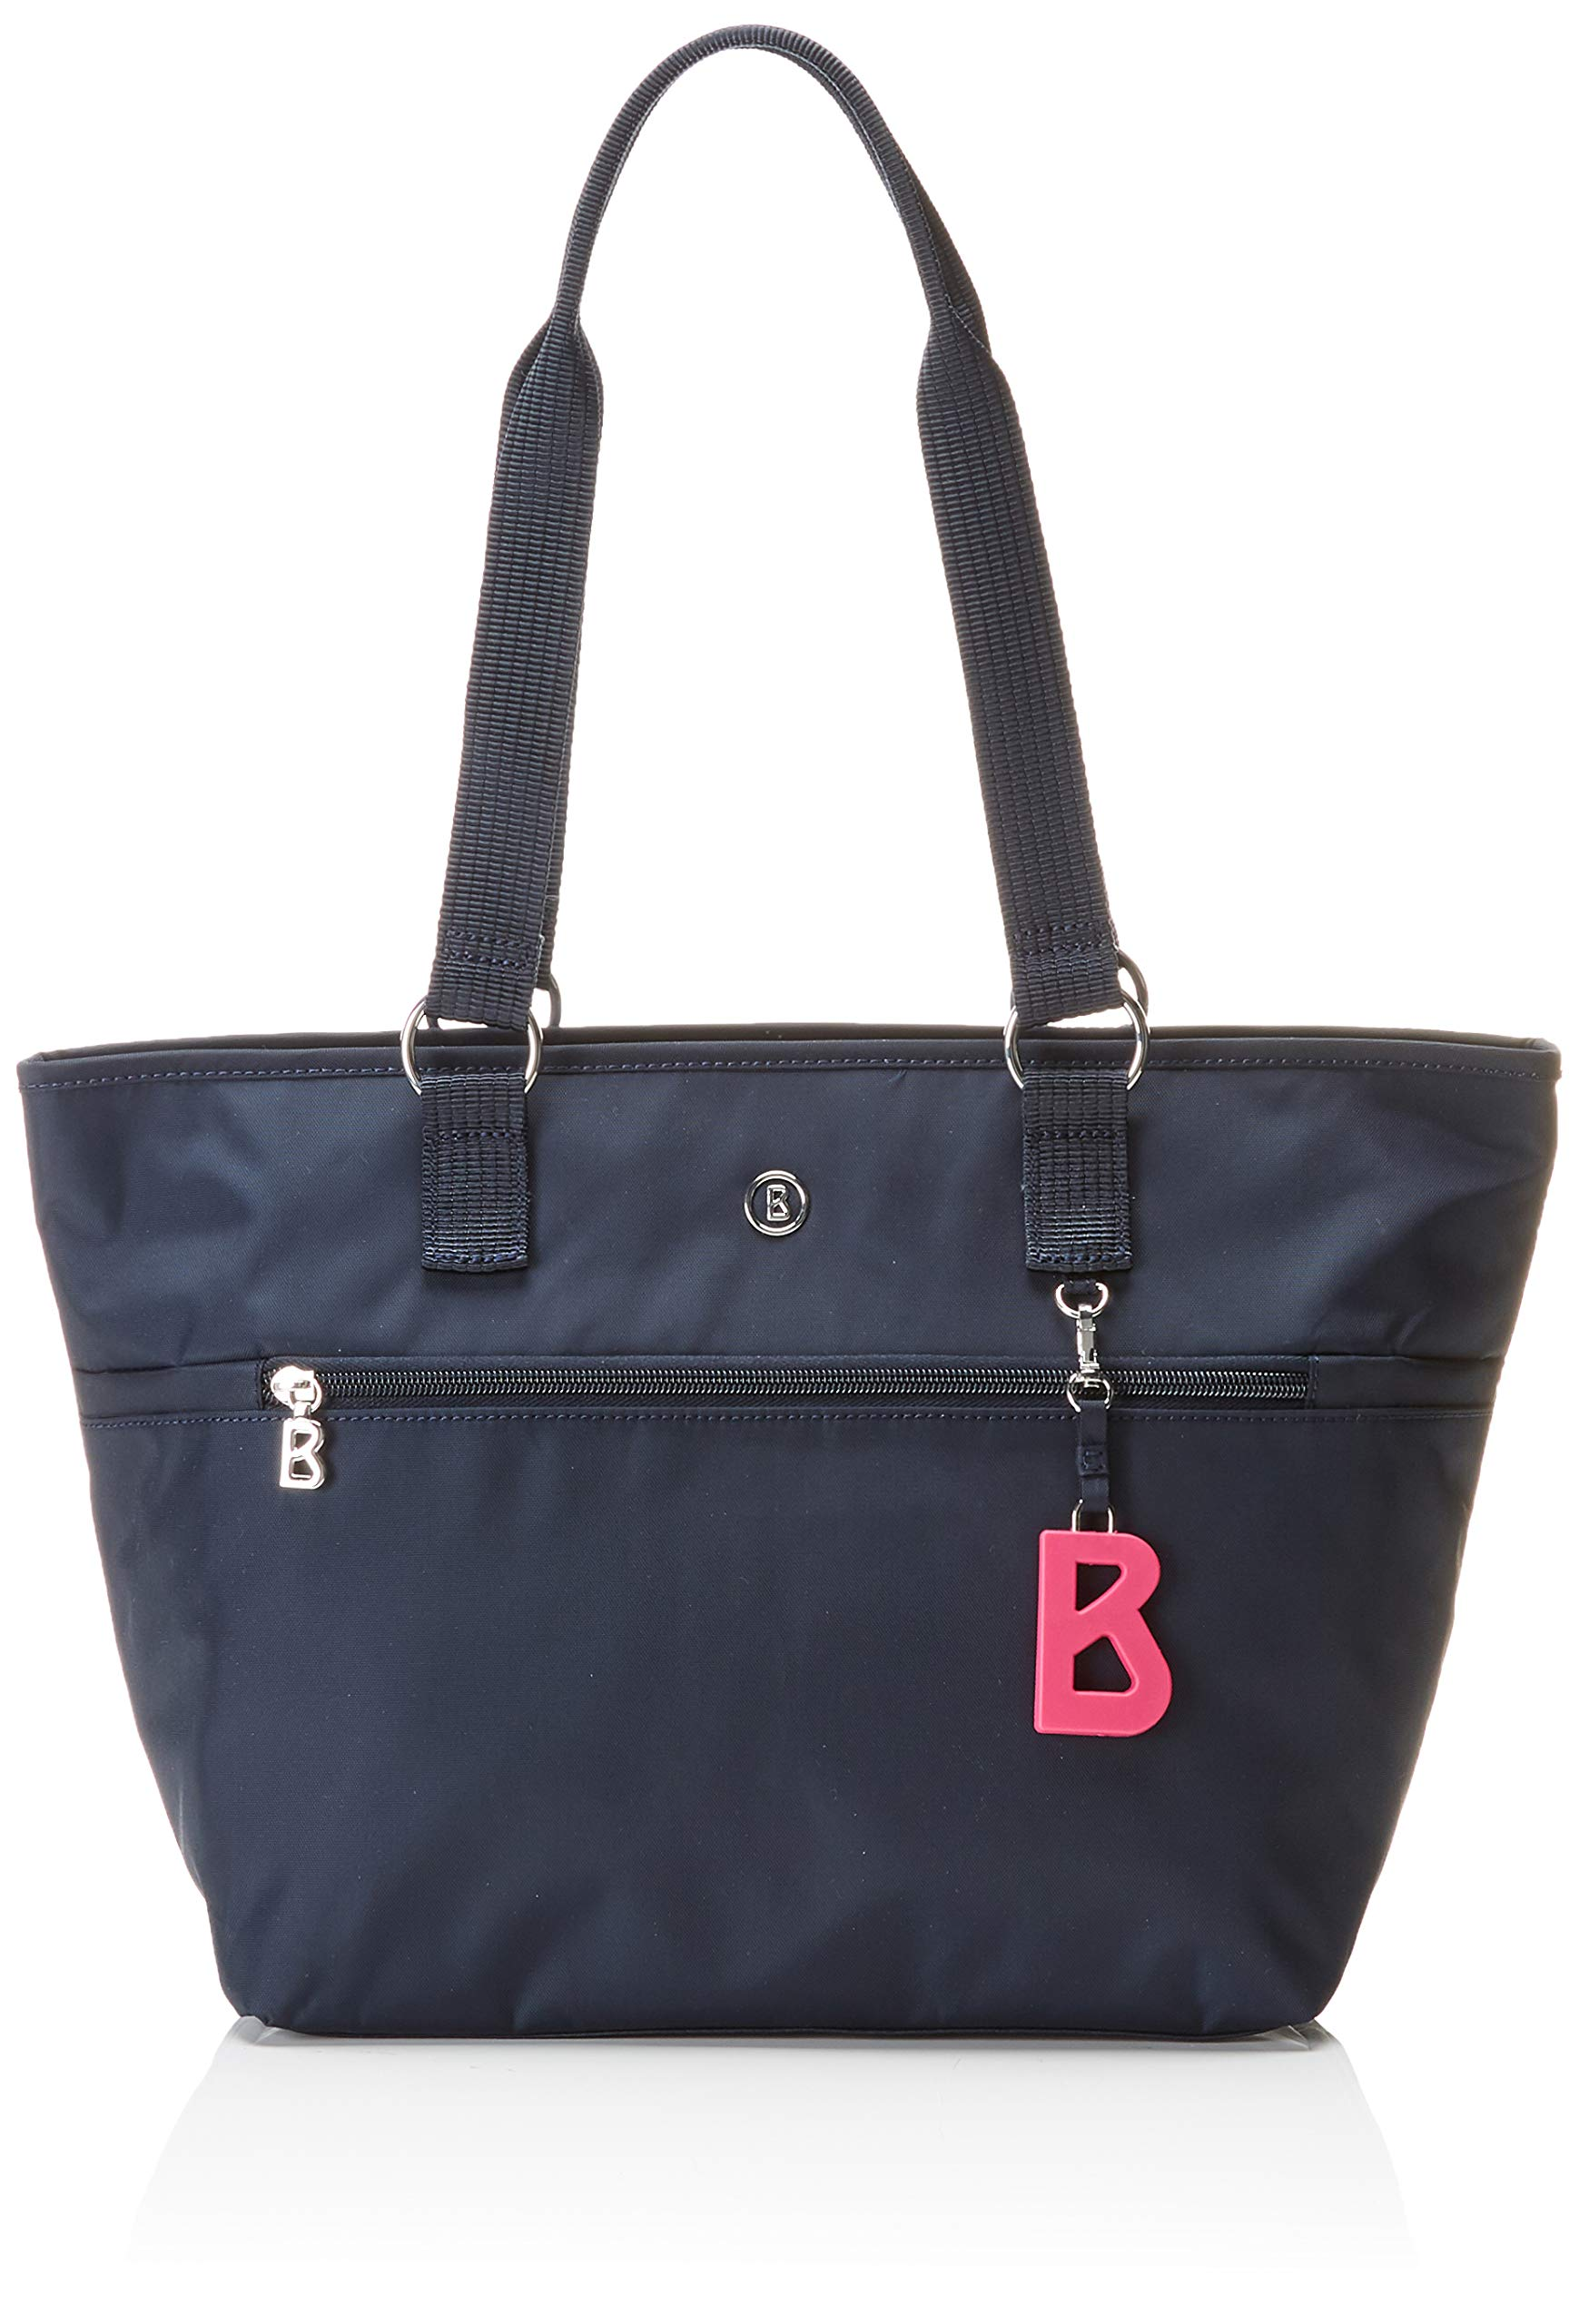 X FemmeBleublaudark 0 T Gesa 0x42 Blue19 Cmb 0x27 Shopper H Verbier LhzCabas Bogner erCxEQoWdB